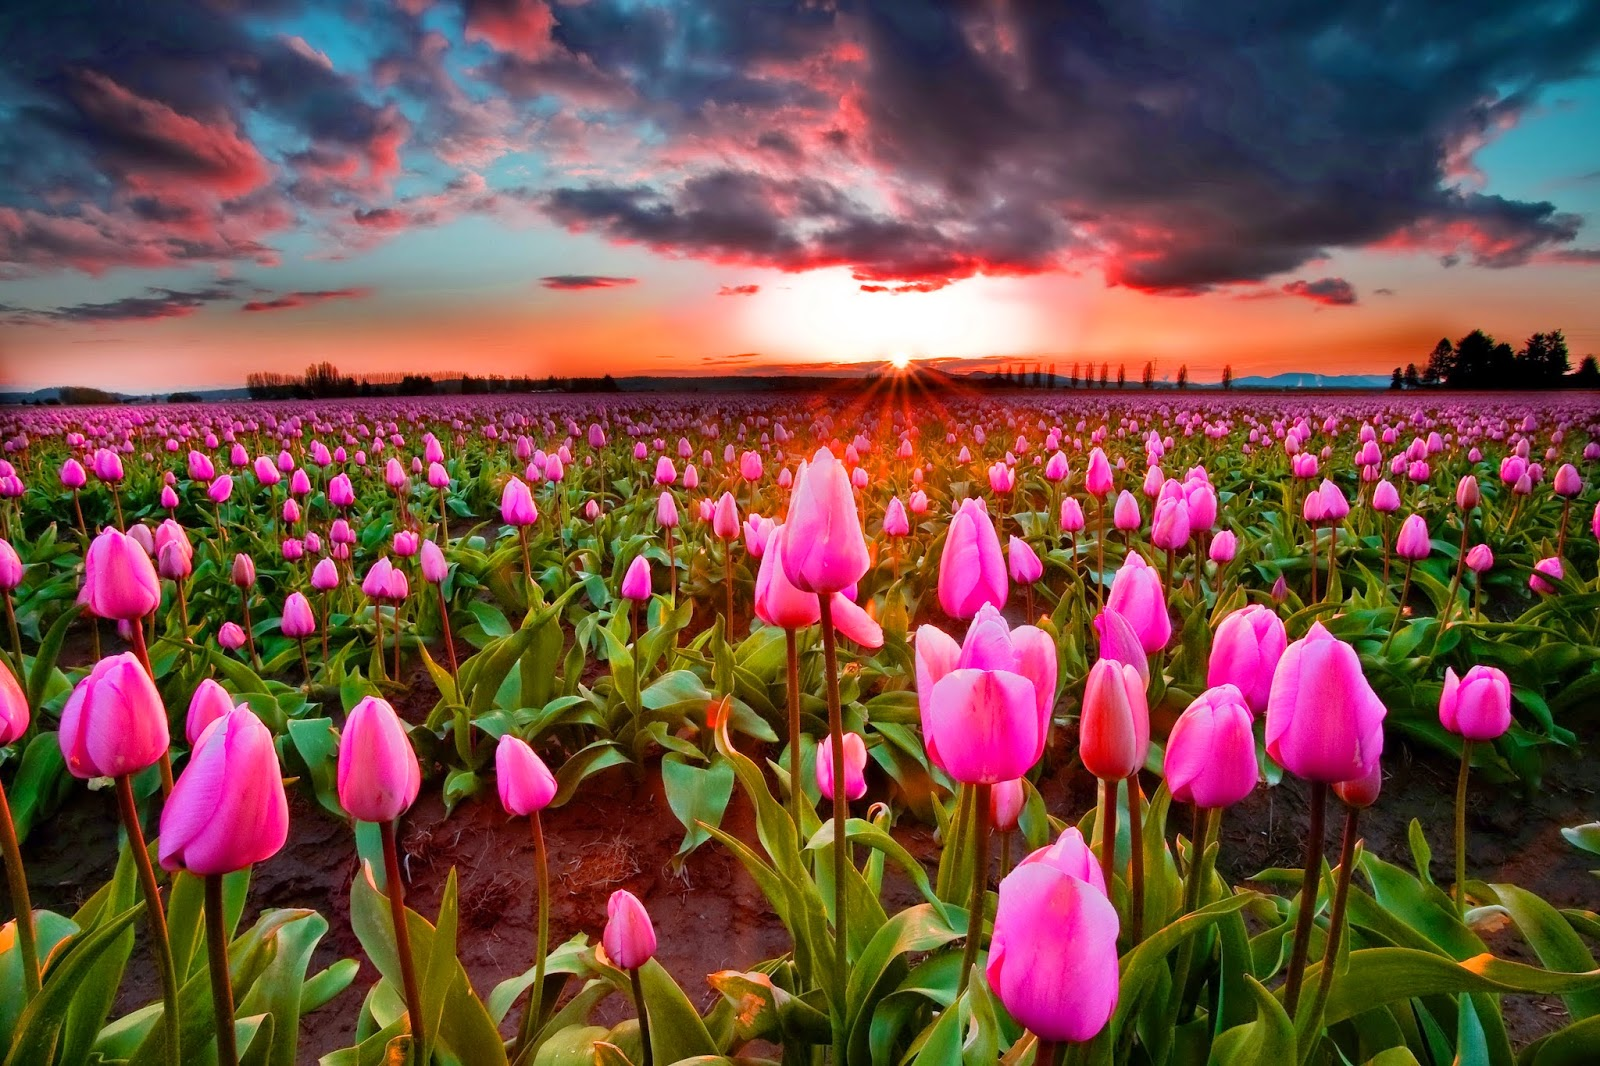 Campo de tulipanes al atardecer